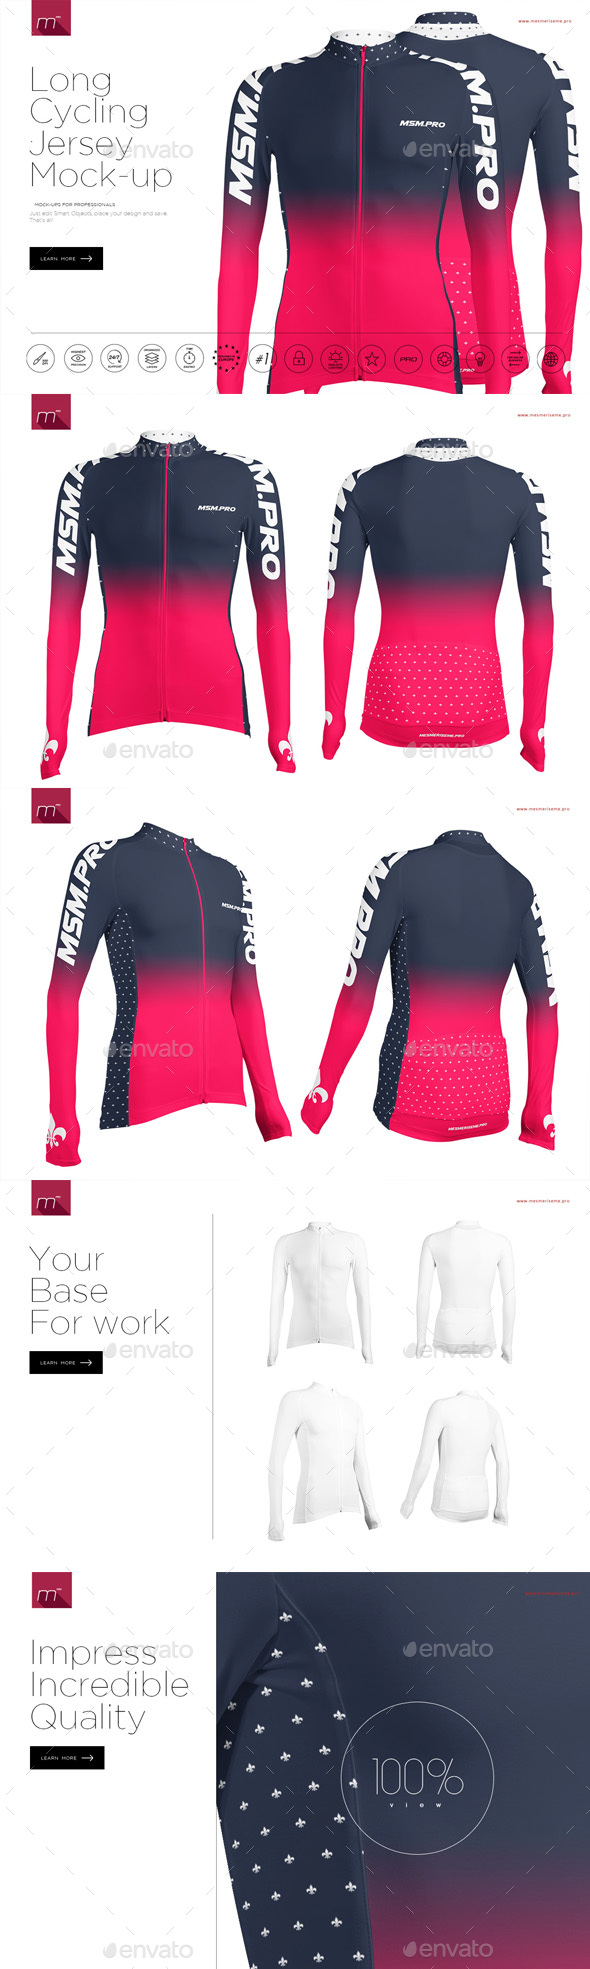 Download Long Cycling Jersey Mock Up Miscellaneous Apparel Mockup Design Bike Design Mockup Photoshop